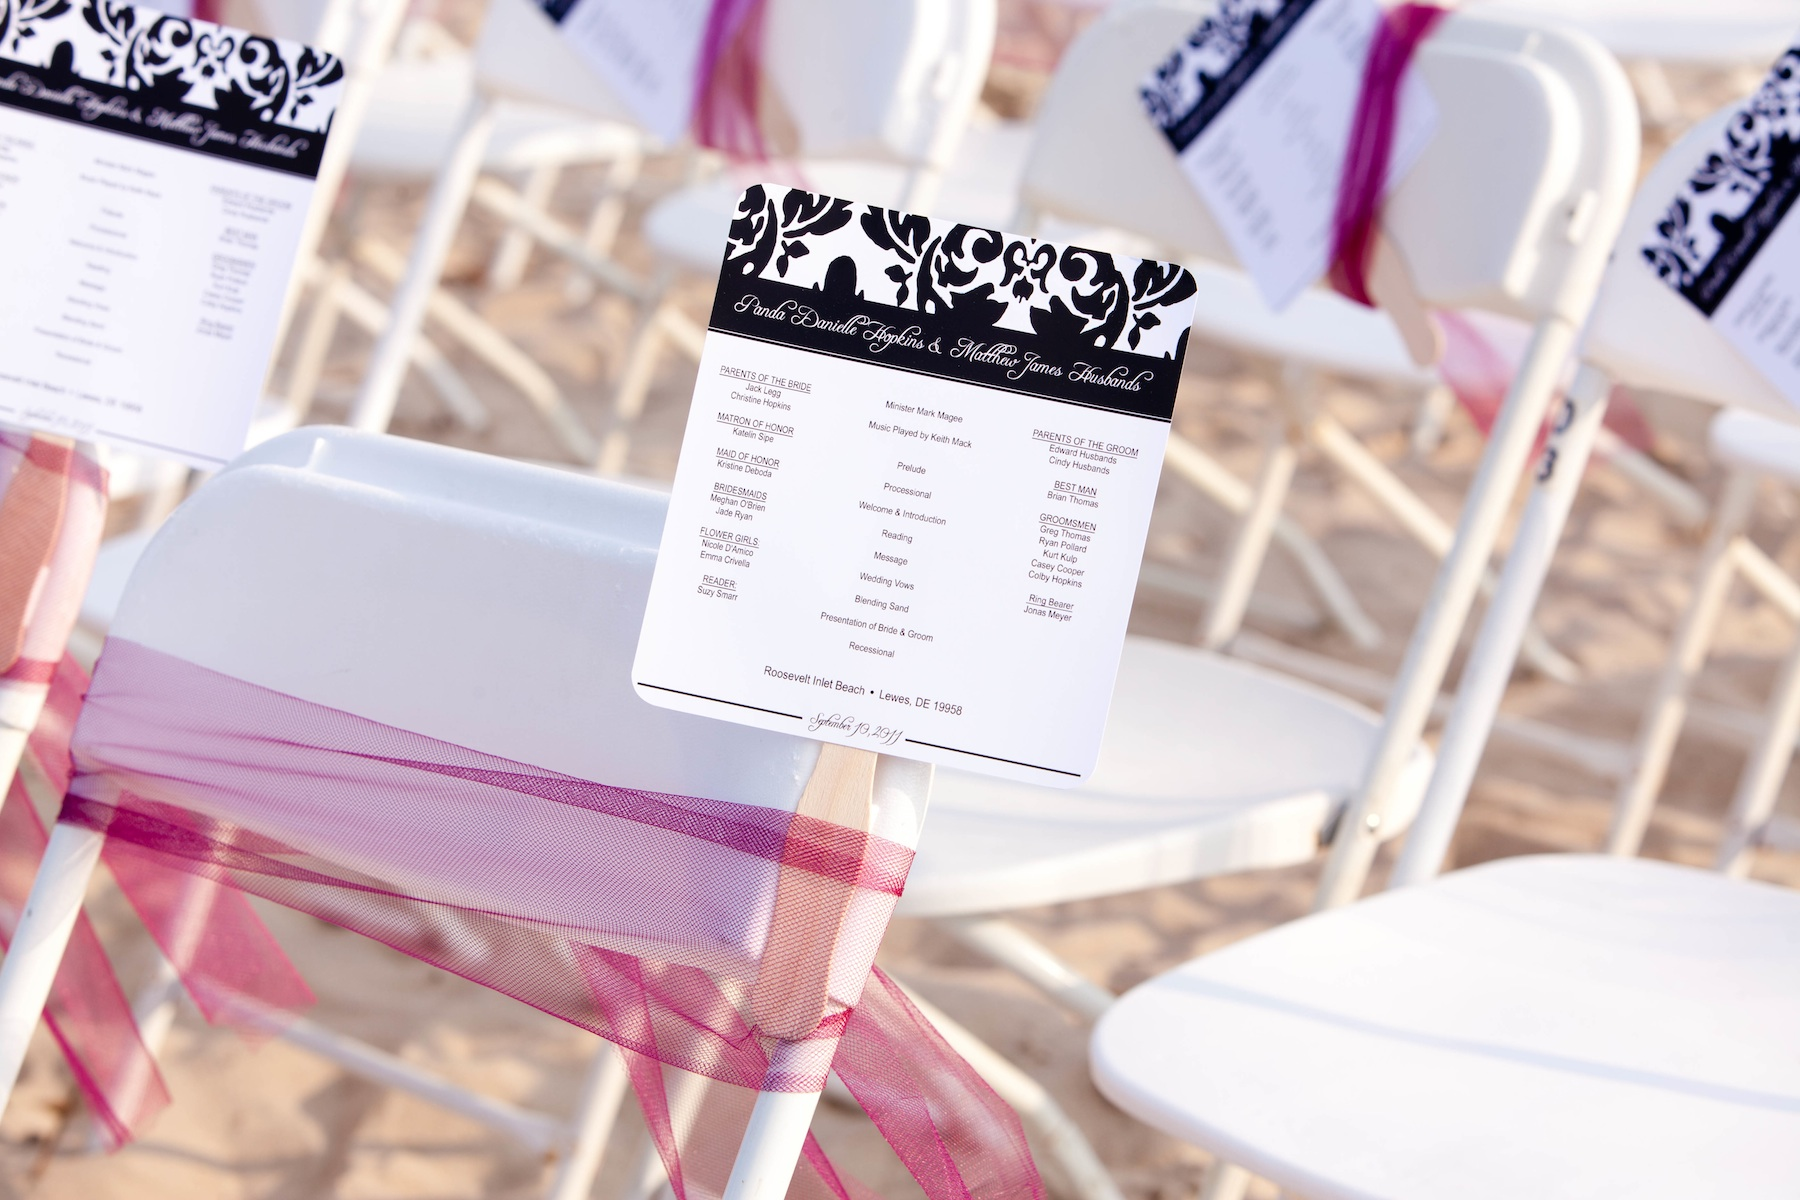 Diy Beach Wedding Ceremony Decorations : Beach wedding with diy decor ceremony chairs onewed